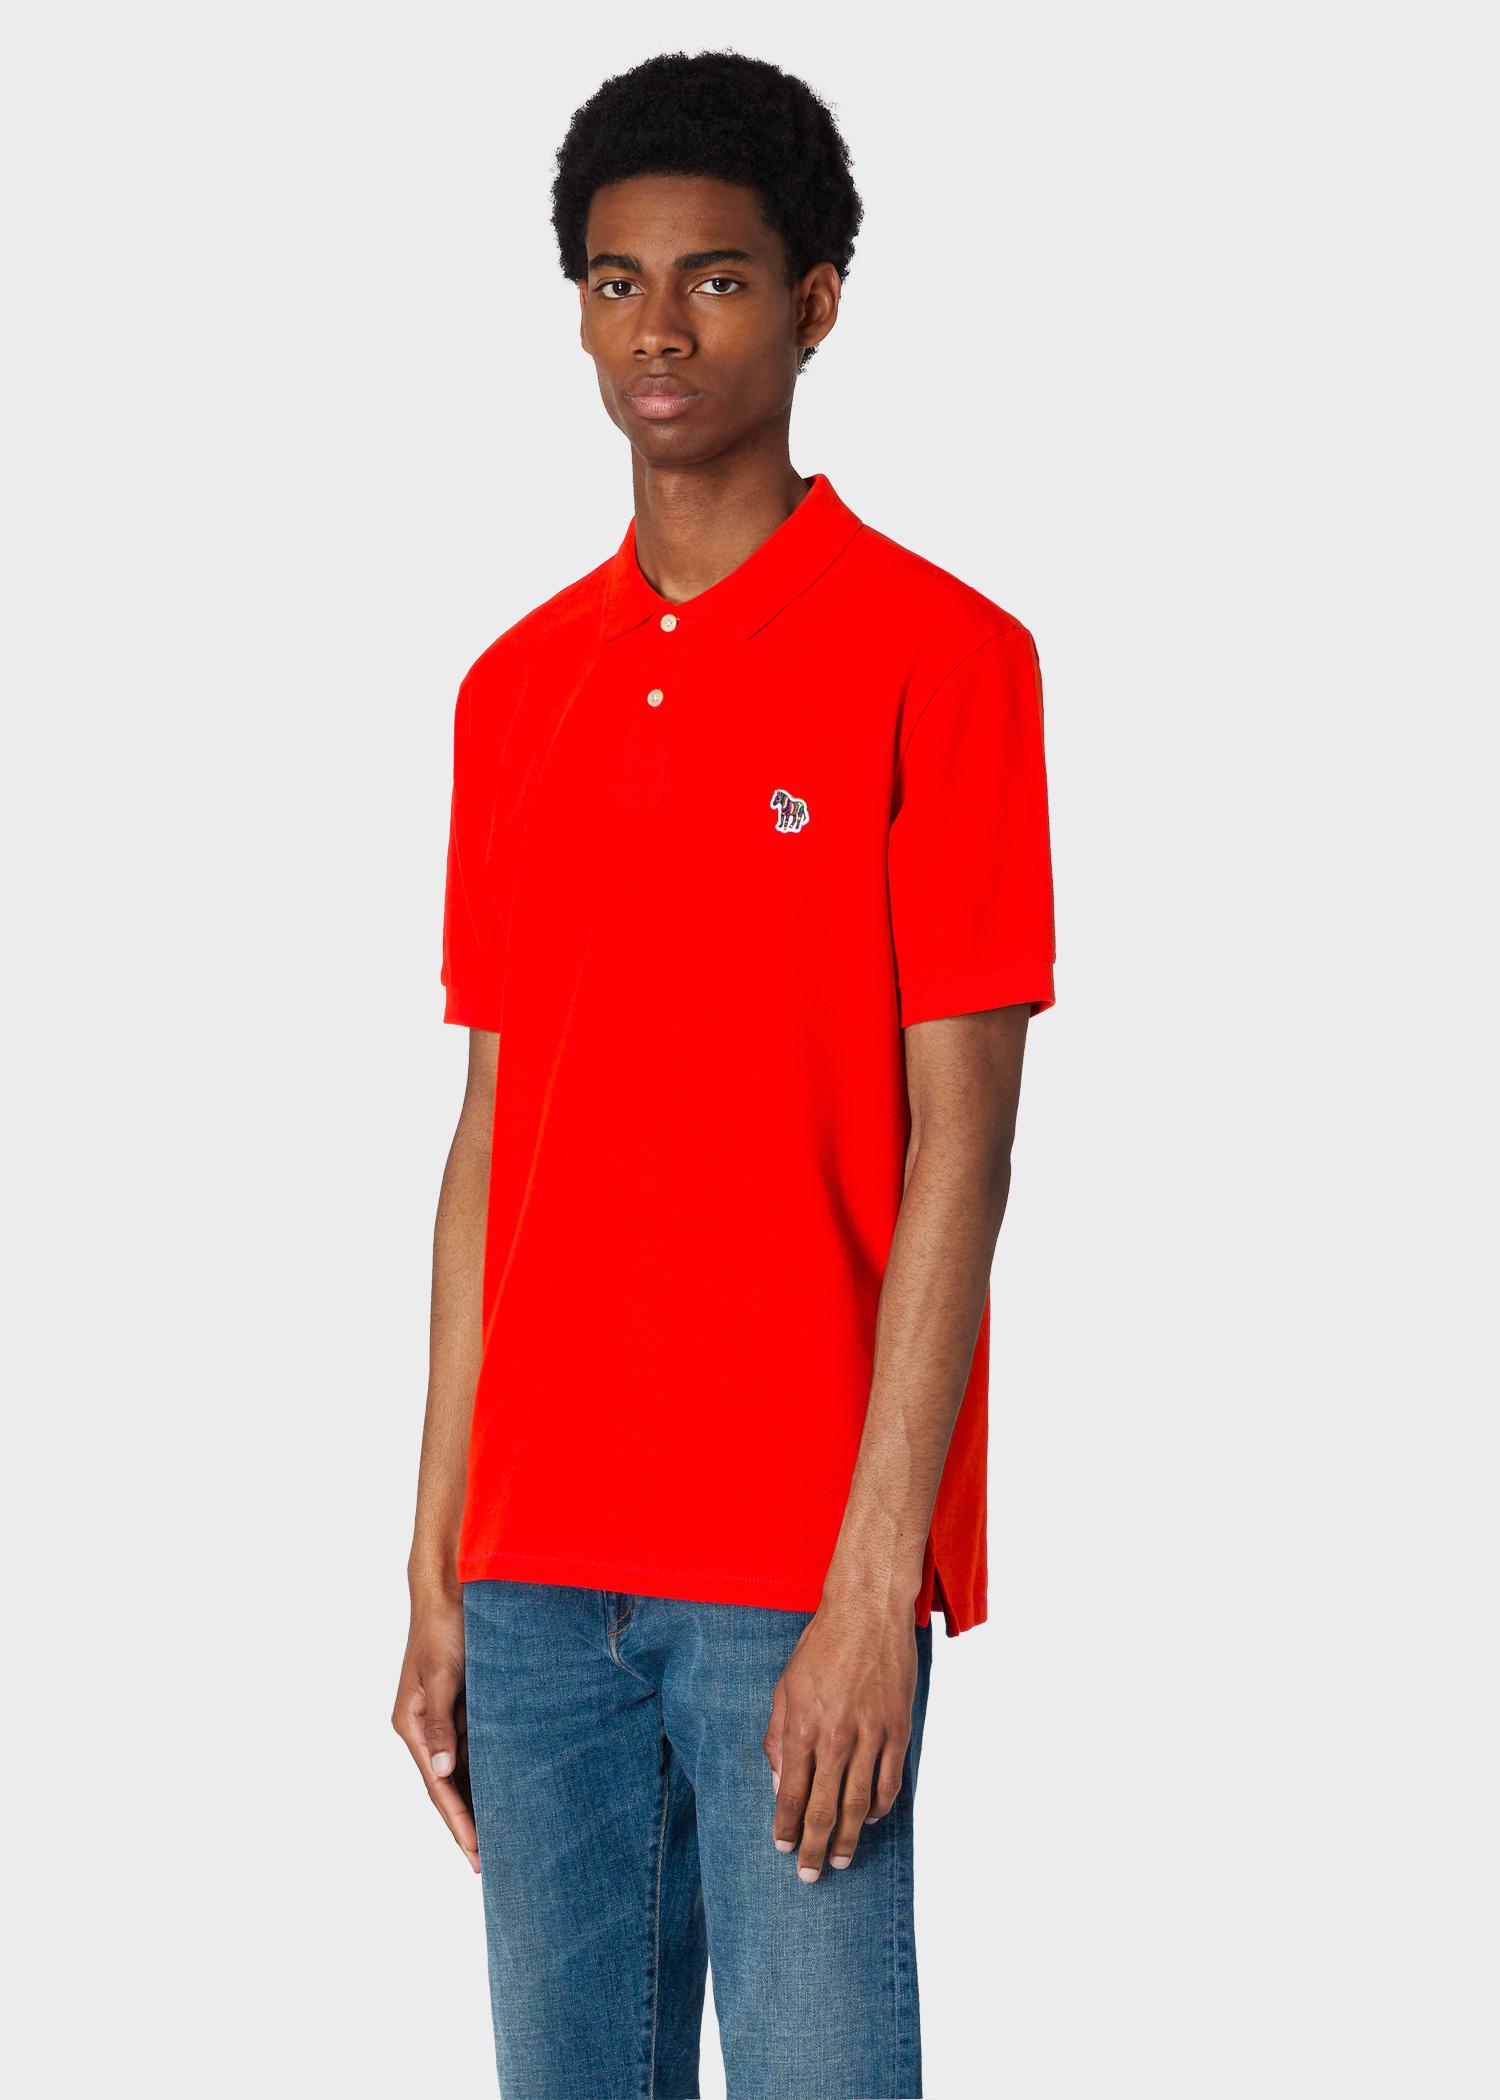 bab46e66 Model front close up - Men's Red Organic Cotton-Piqué Zebra Logo Polo Shirt  Paul